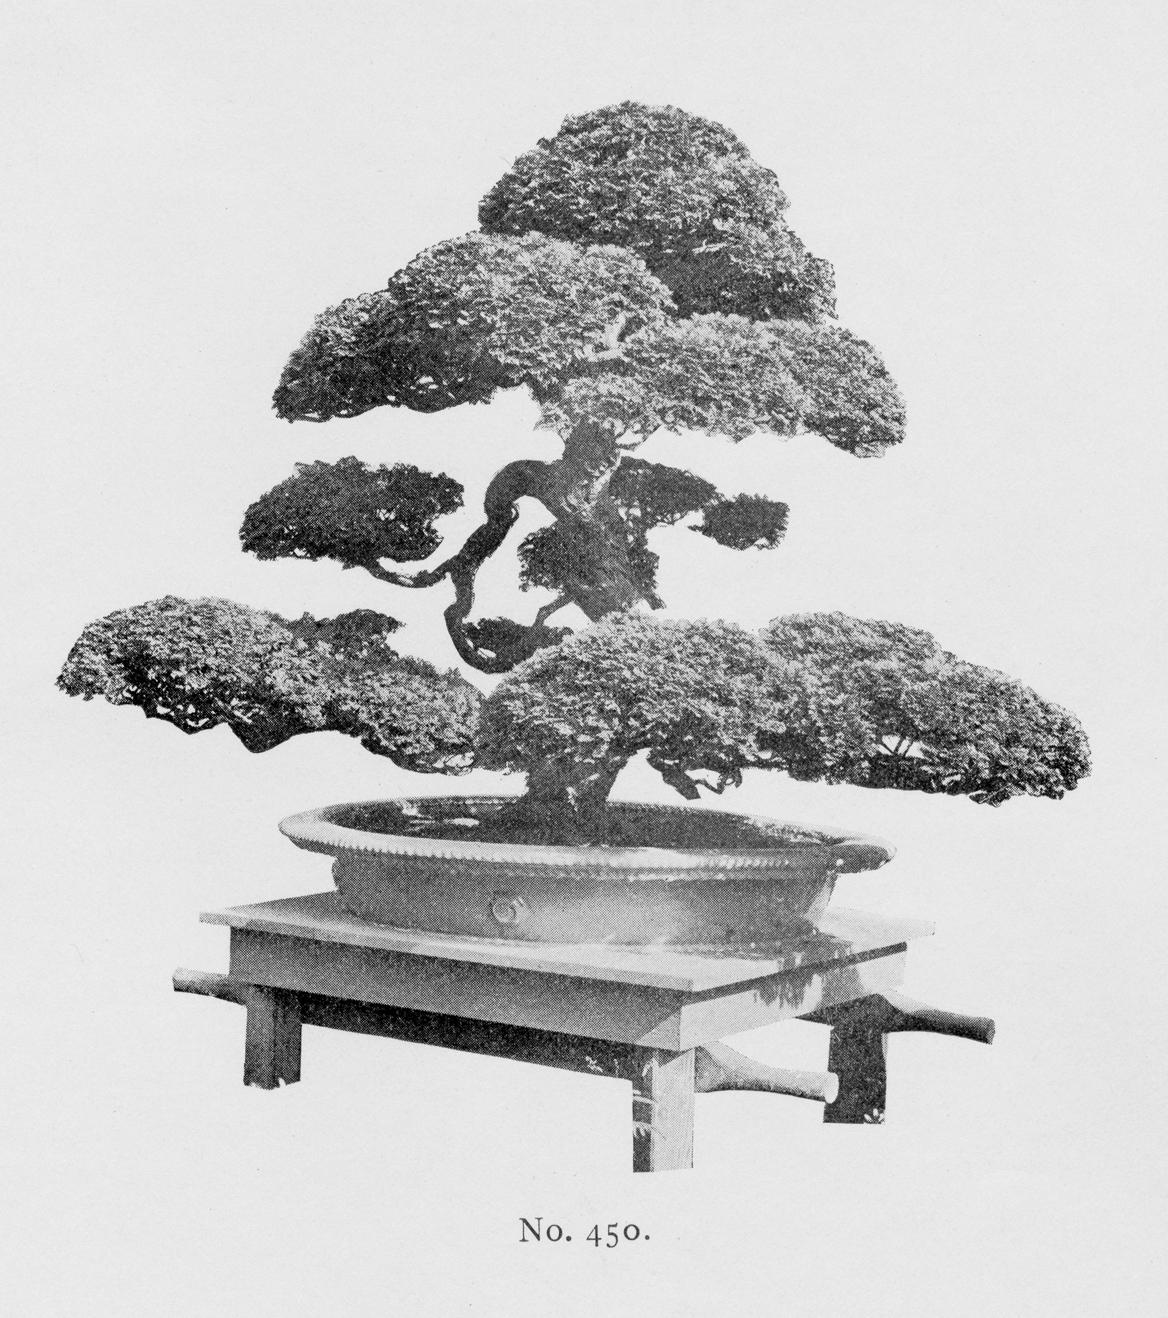 Black-and-white illustrationof large bonsai